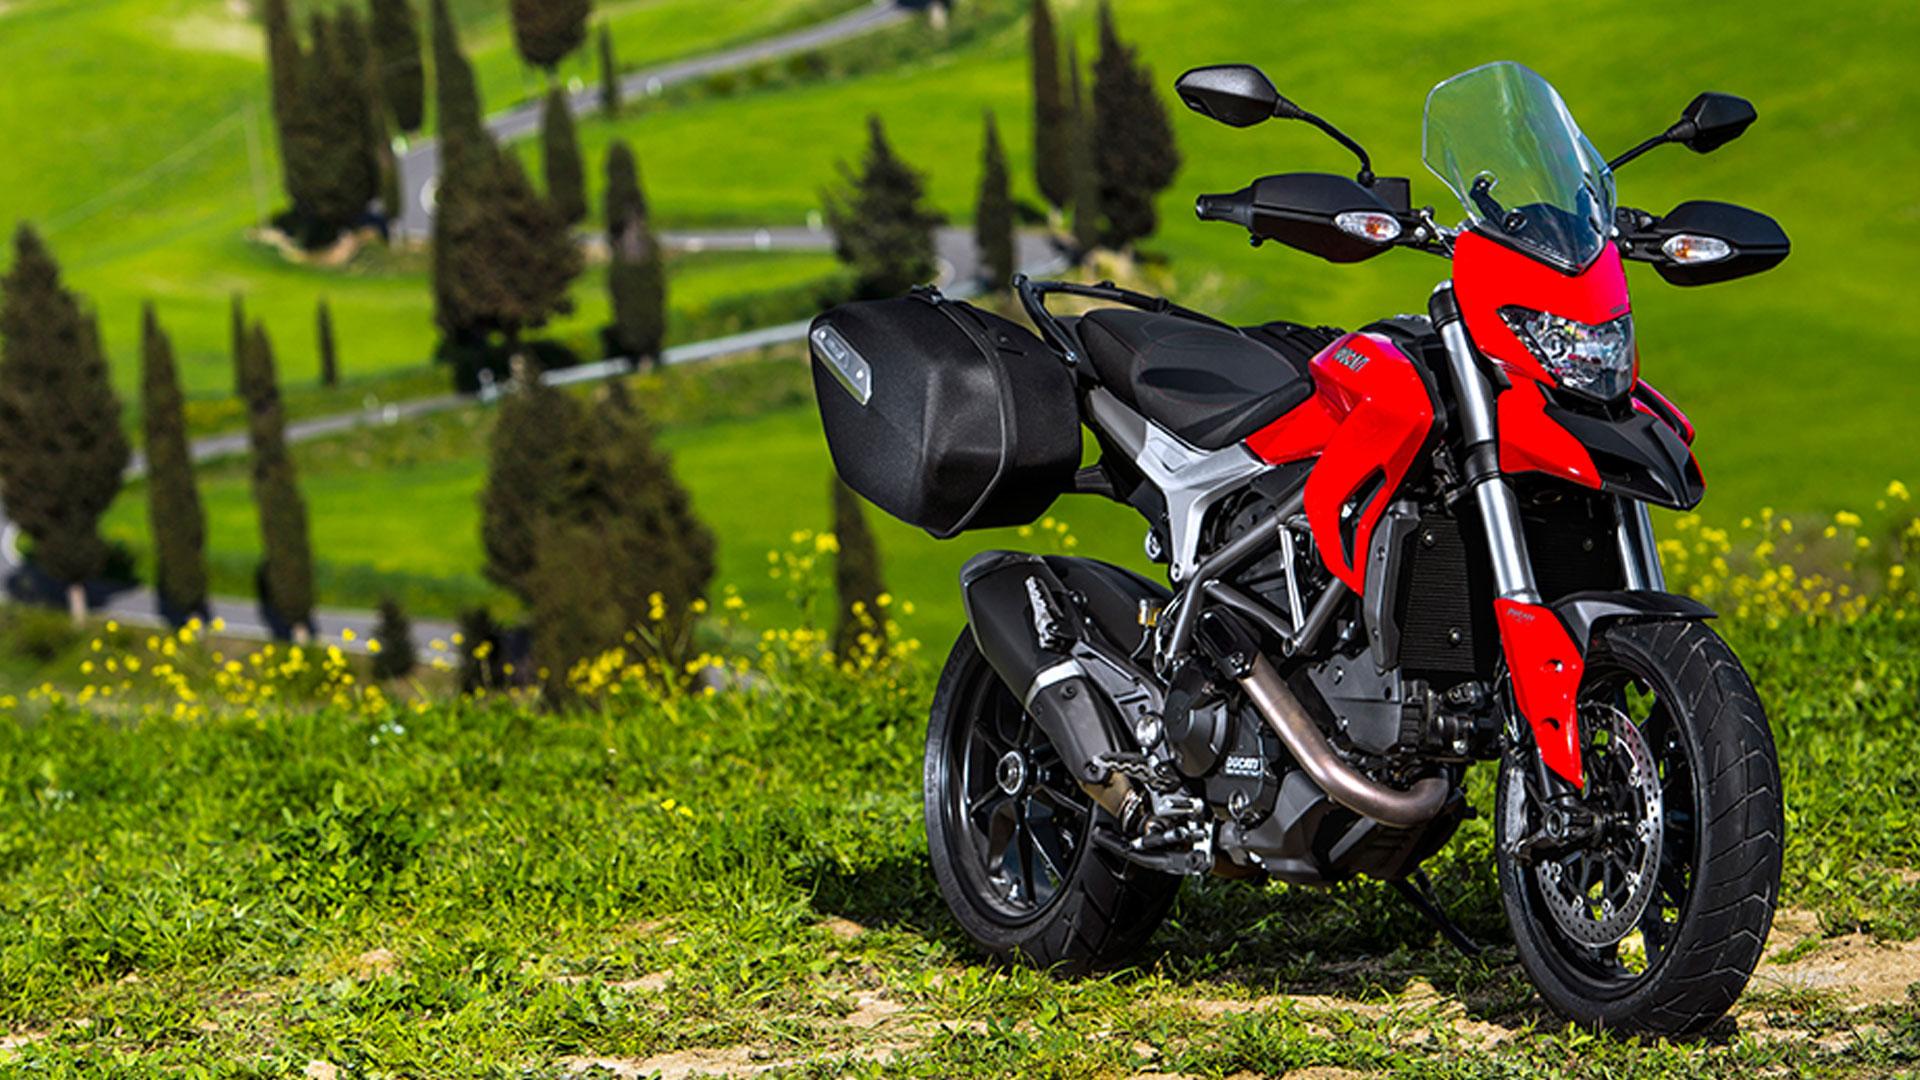 Ducati Hyperstrada 2015 STD